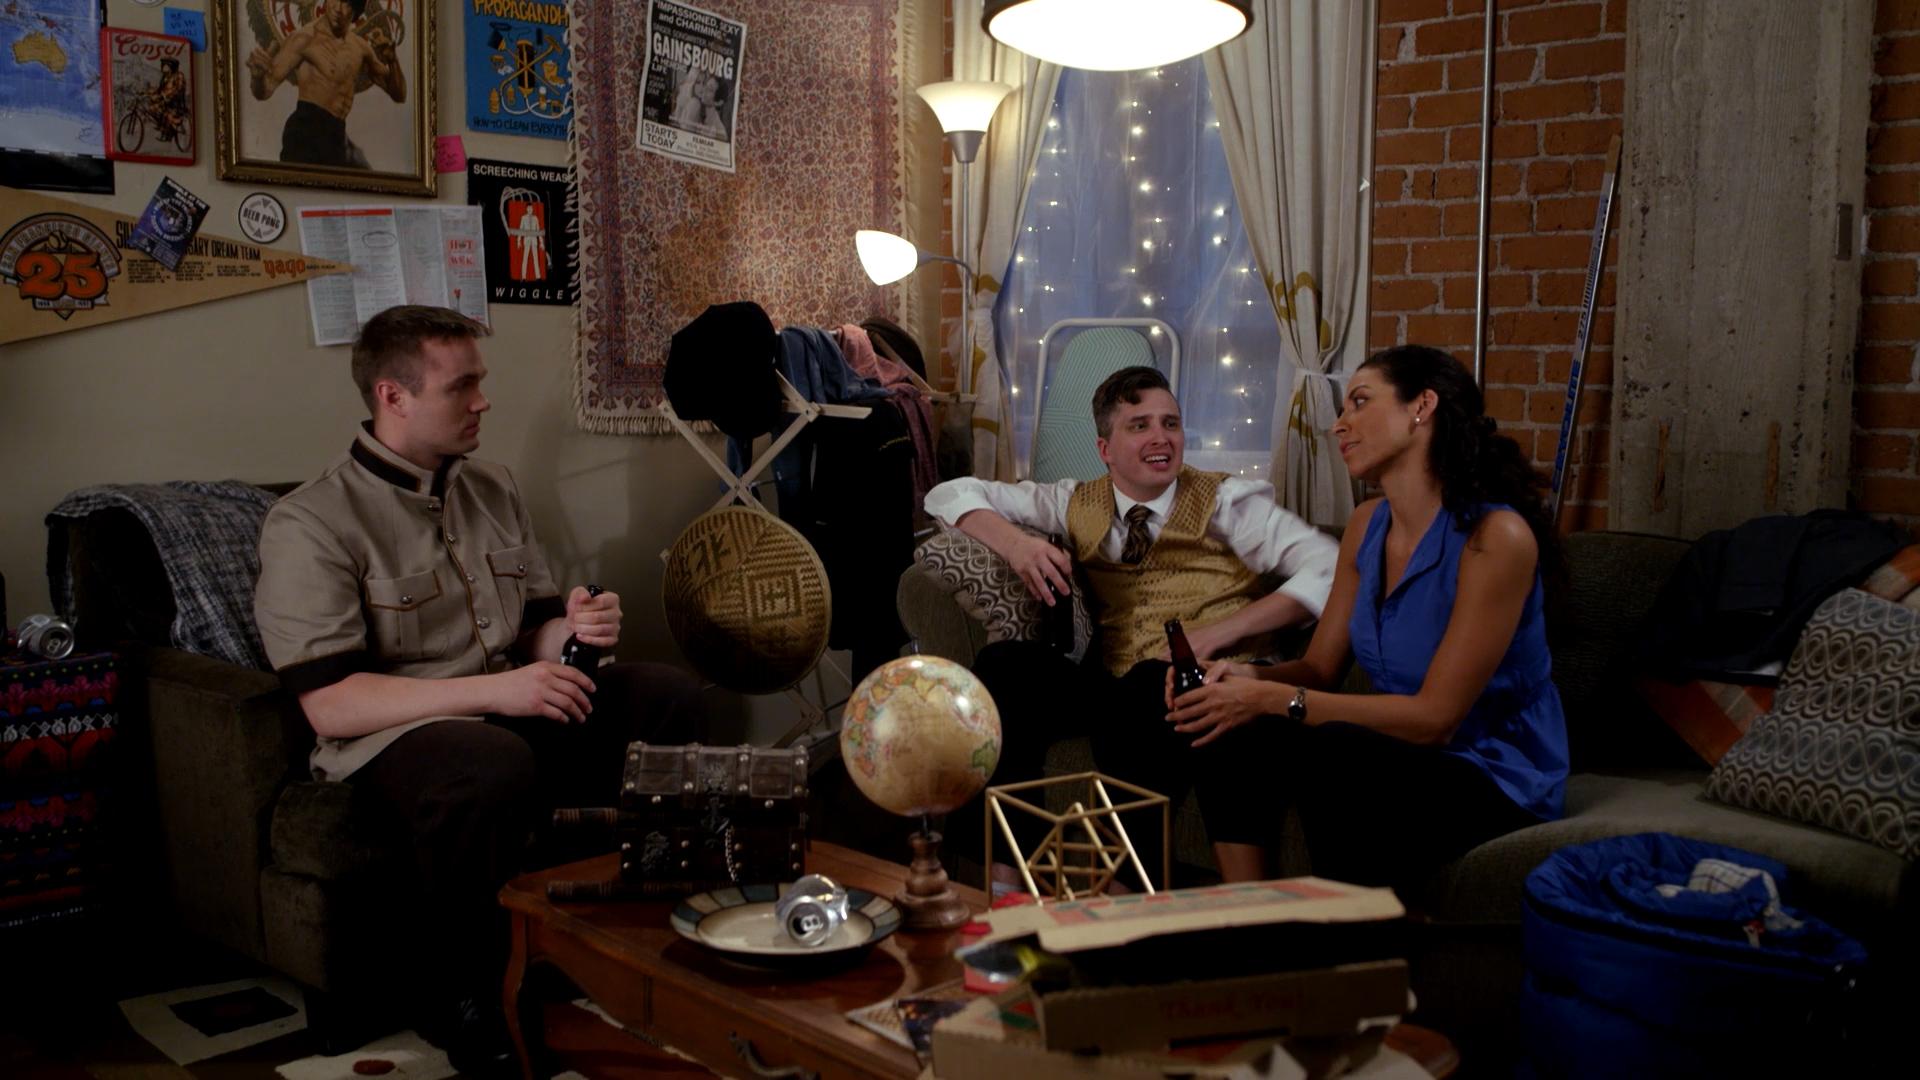 Eric-Lee Olsen, Shana Eva, and Robert Sherry in Planet George (2020)